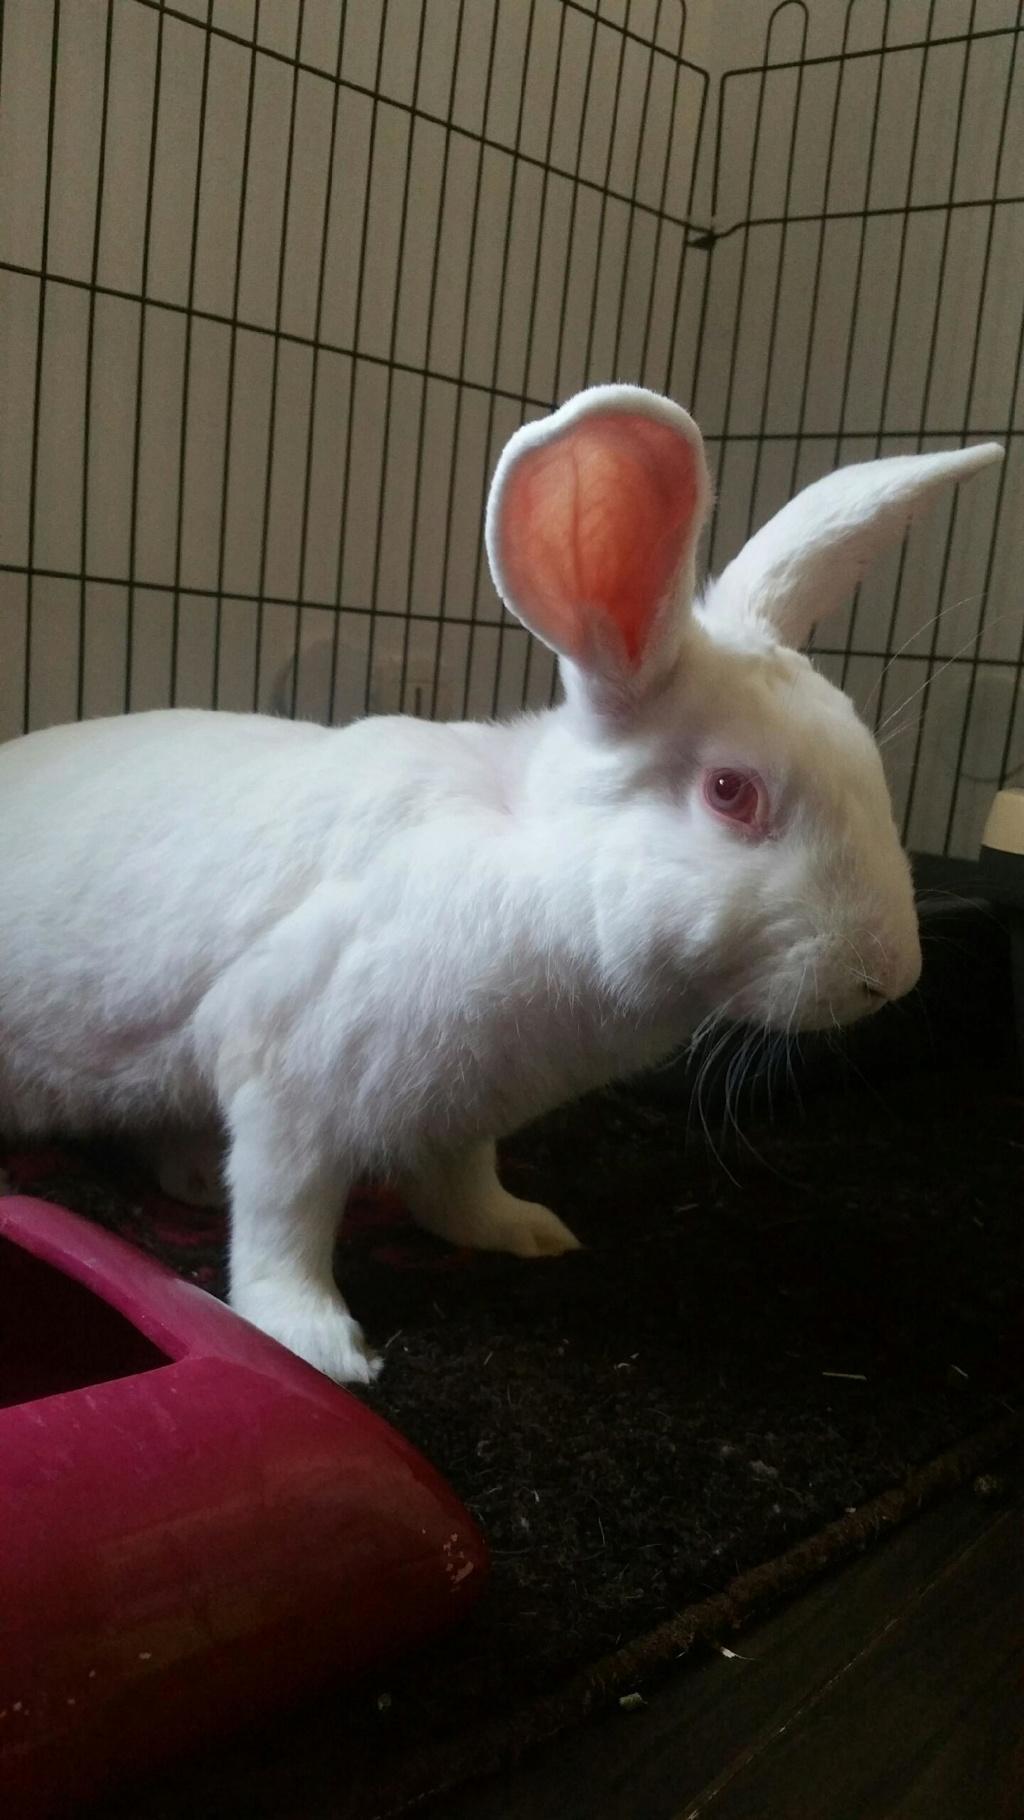 [ADOPTE] Olaf, lapin réhabilité de laboratoire Olaf_111